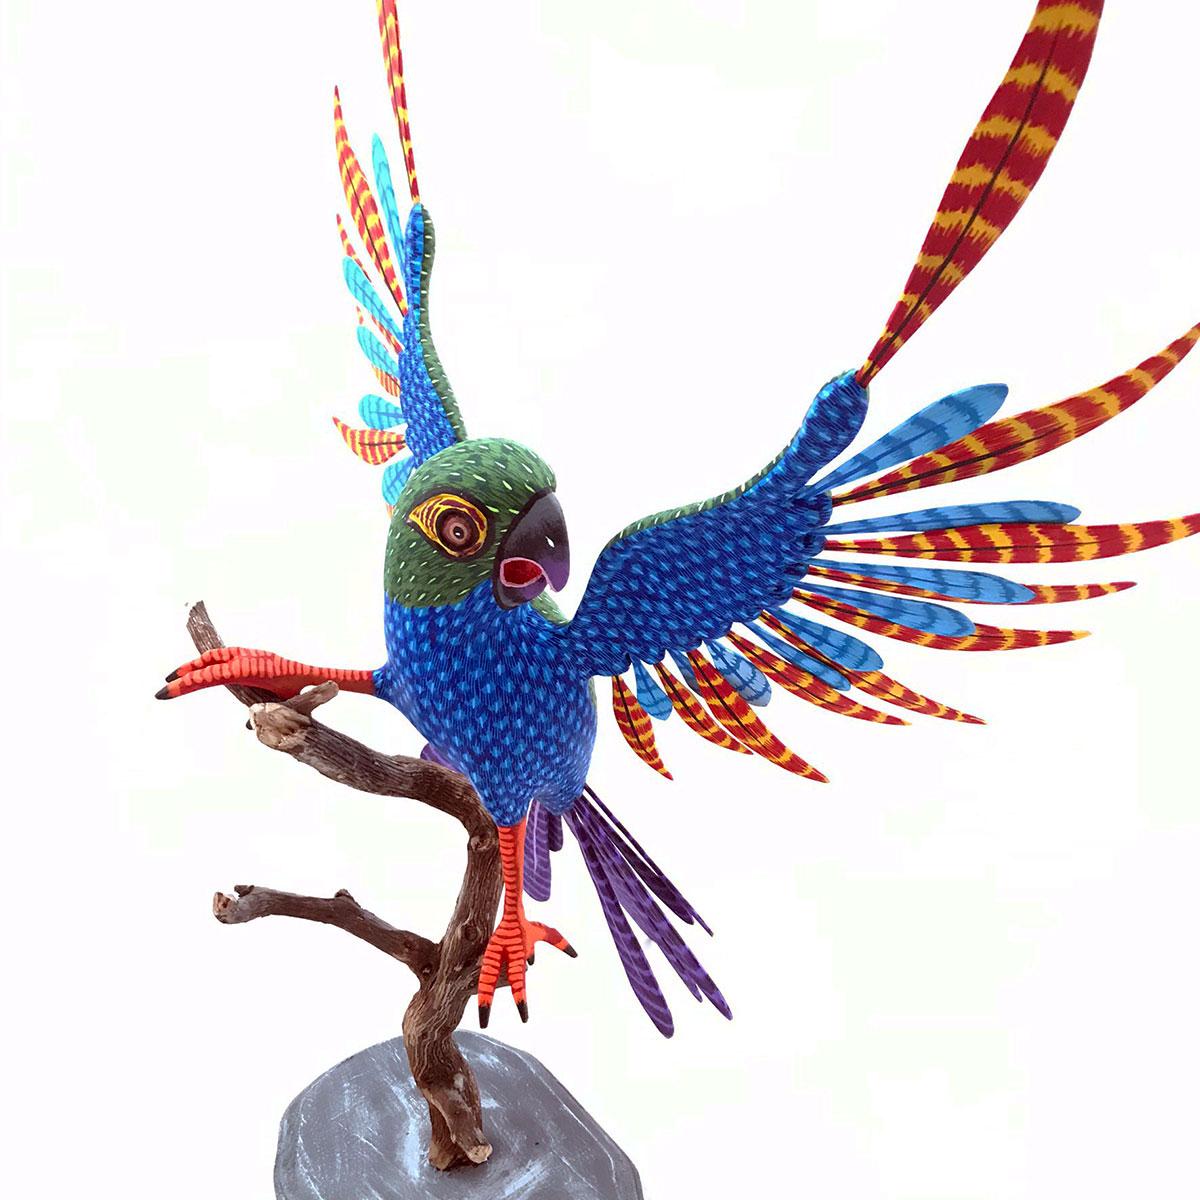 Eleazar Morales Eleazar Morales: Large Parrot on Branch Birds